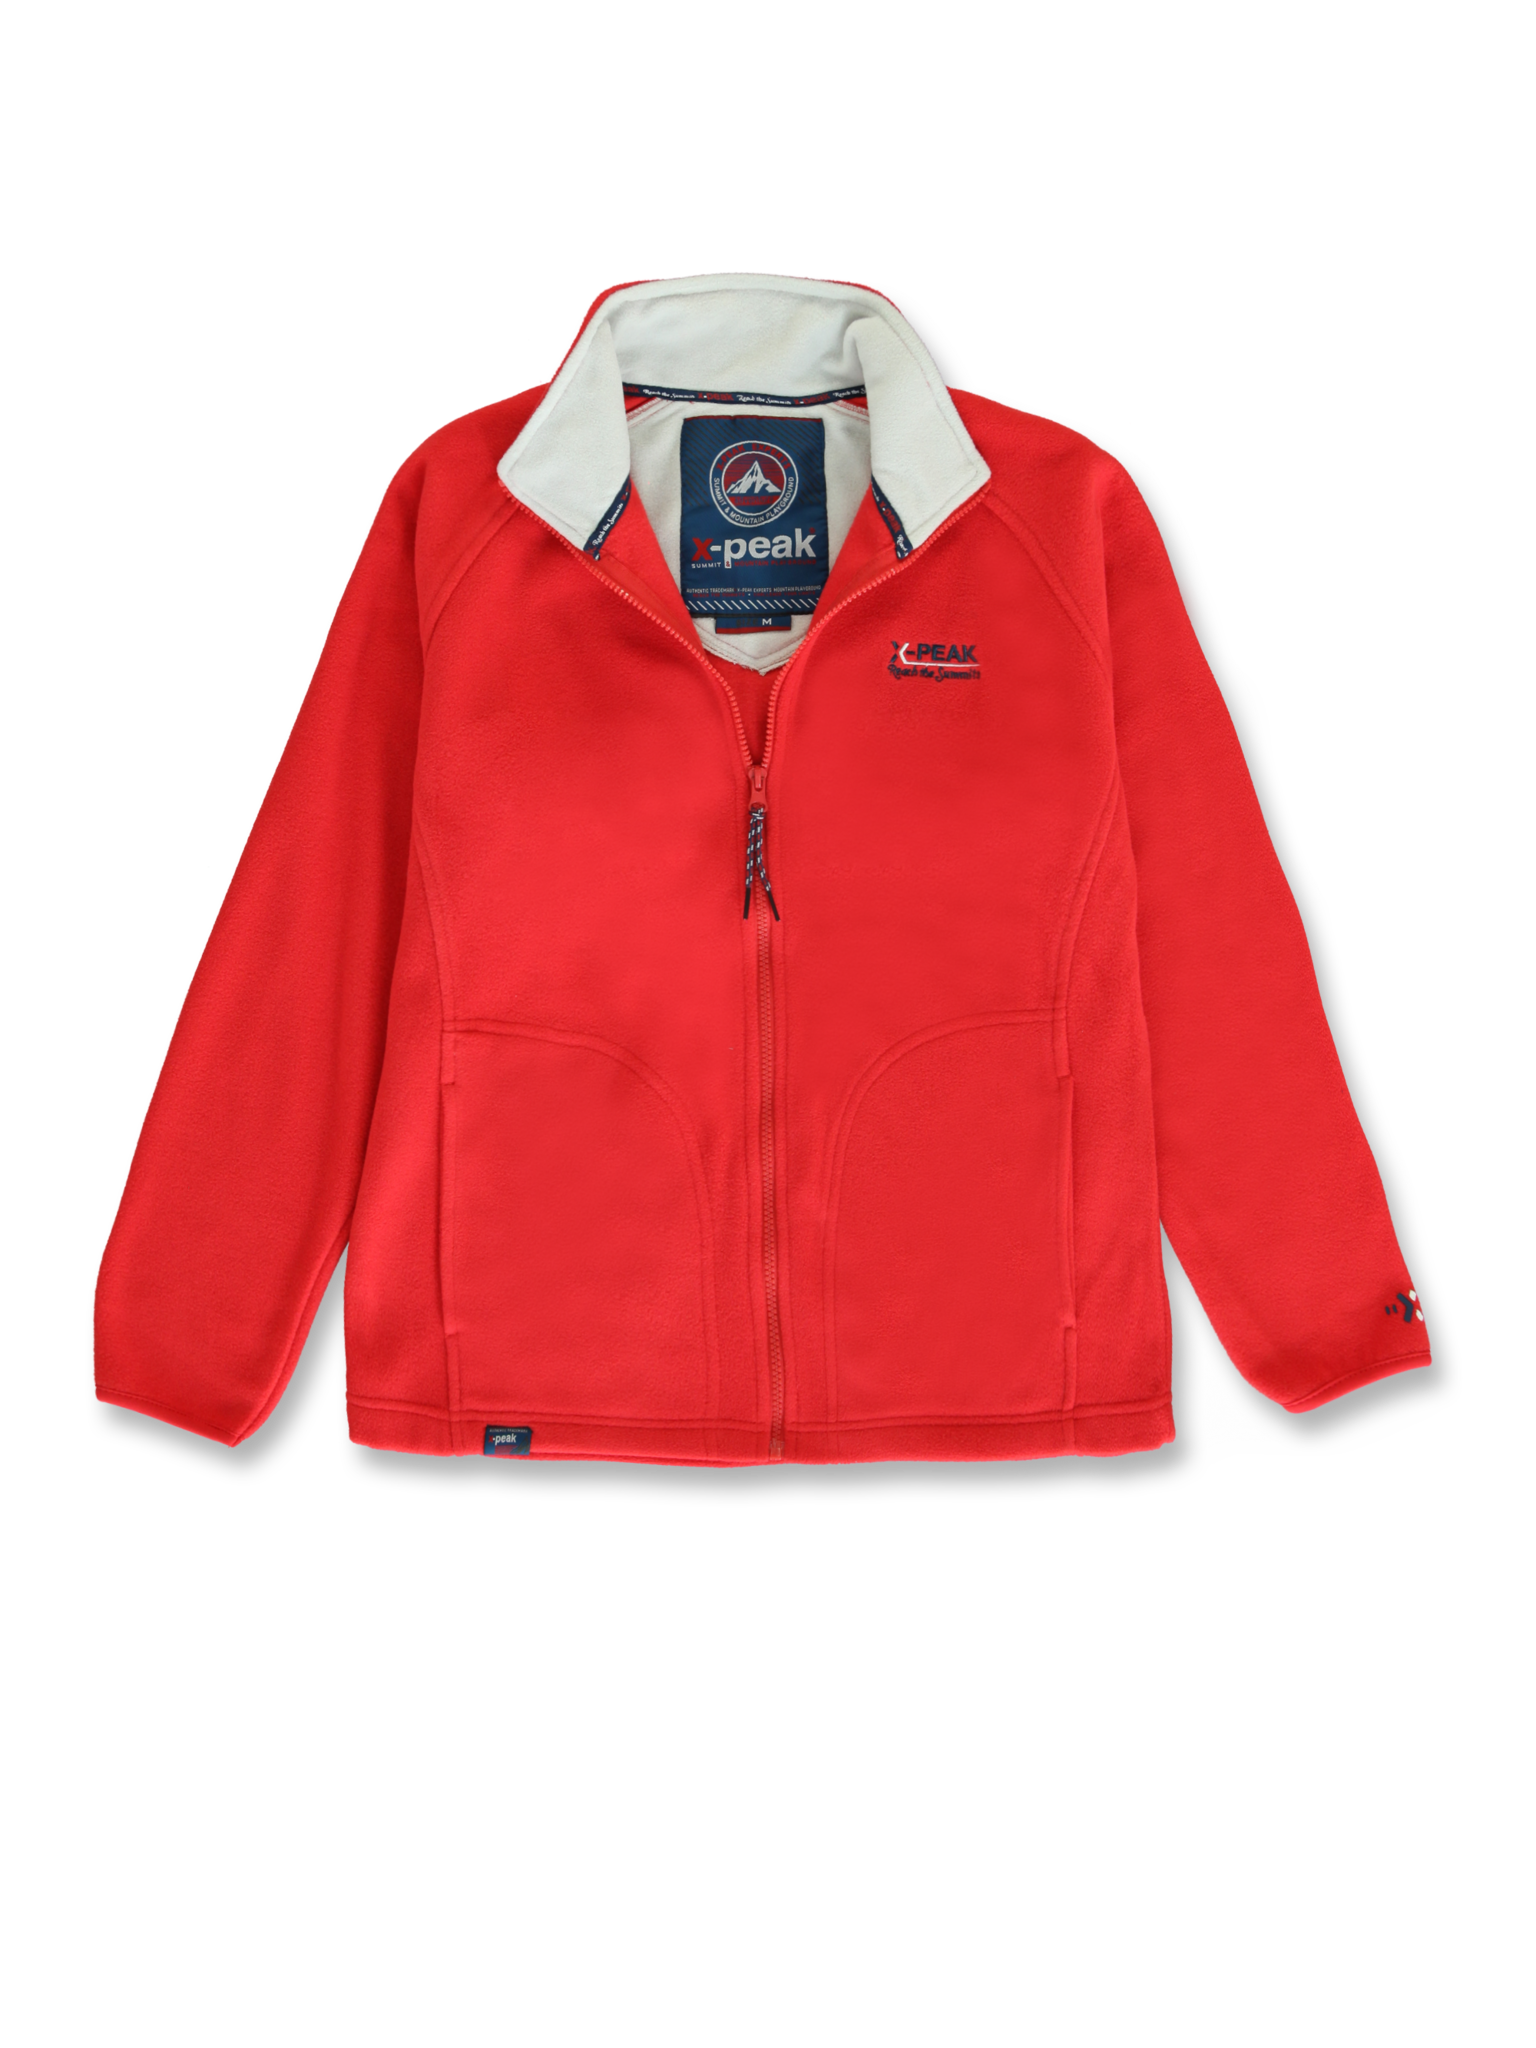 All Brands | Winterproducts Ladies | Cardigan Sweater | 25 pcs/box